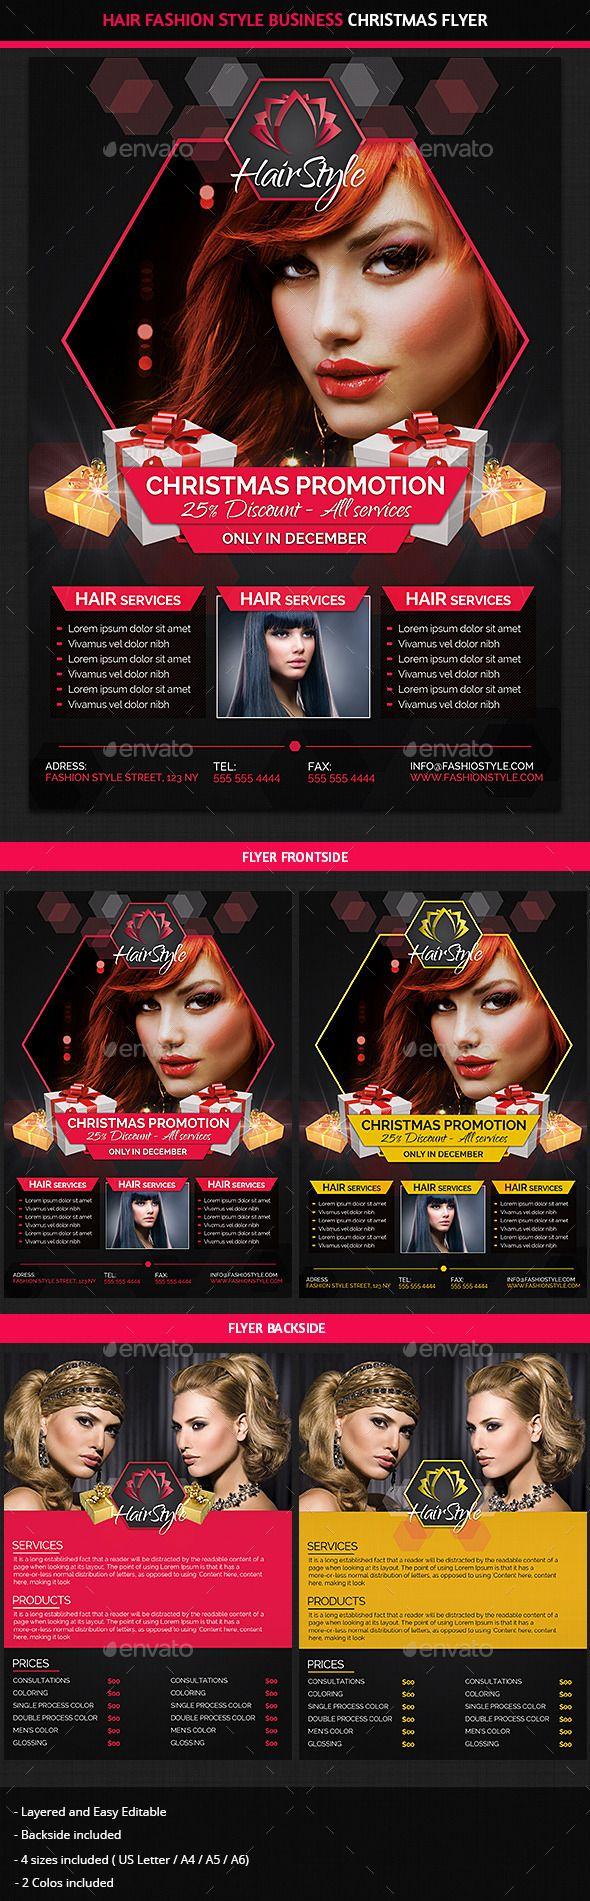 Hair Salon Christmas Promotions Commerce Flyer - Commerce Flyers